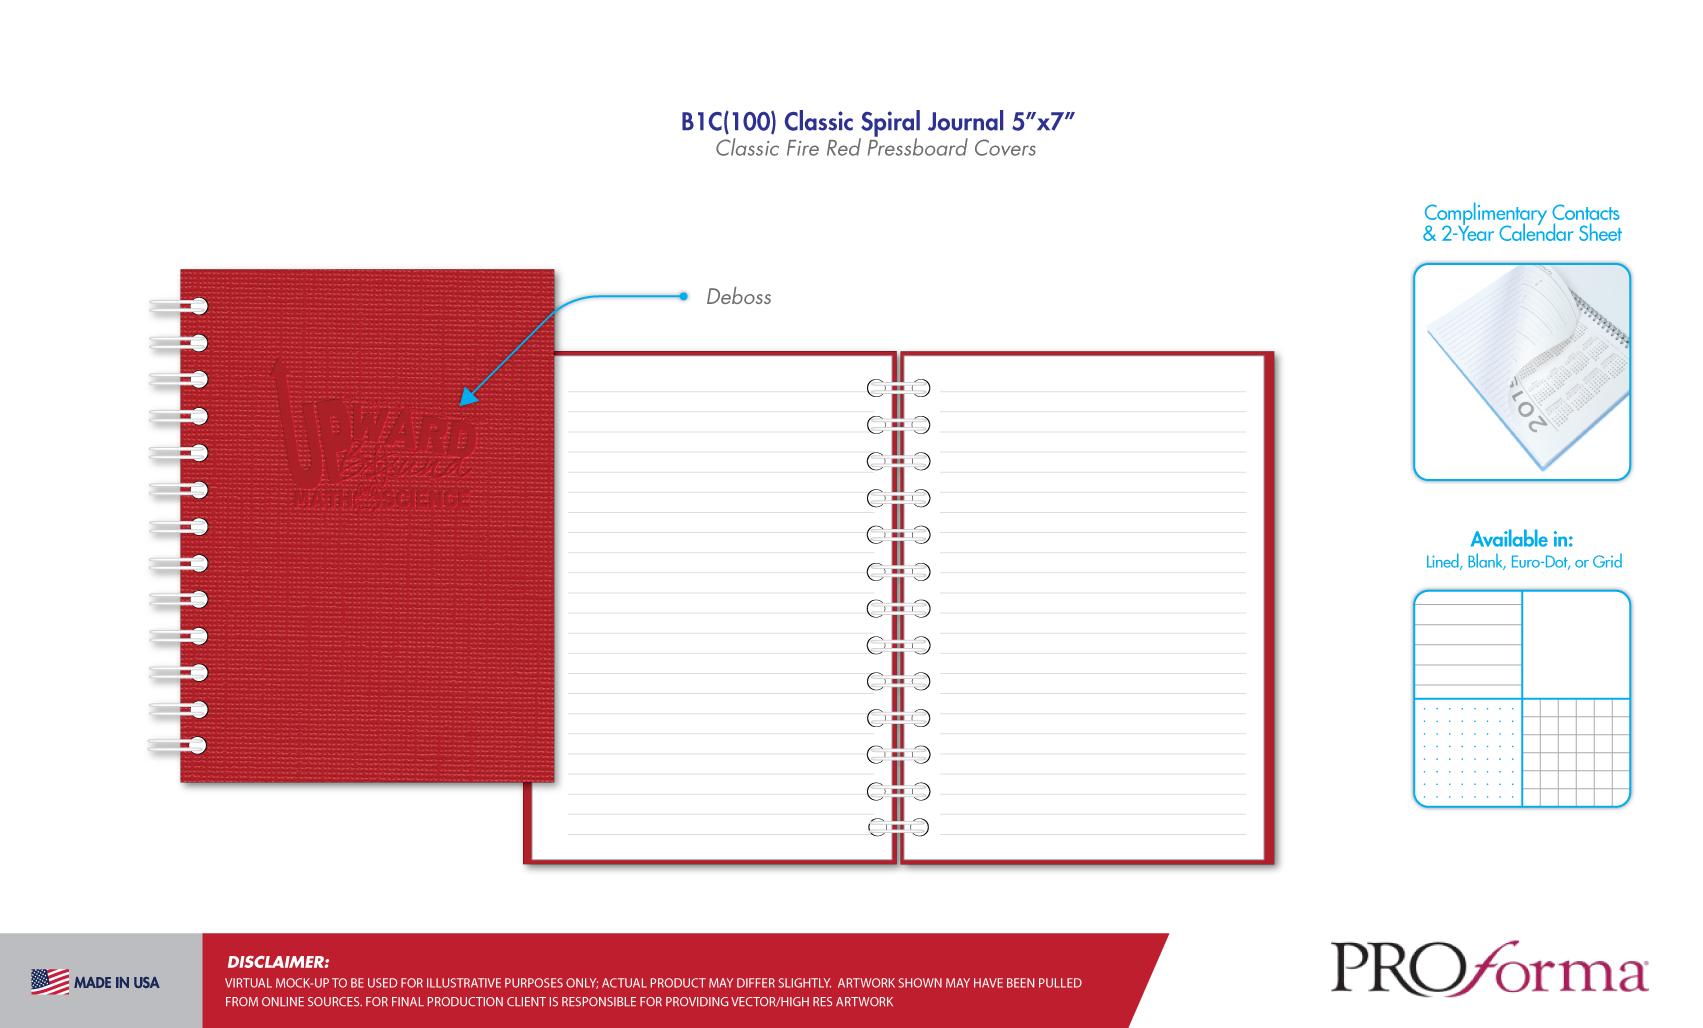 TRIO Custom Journals | Proforma TRIO Ideas